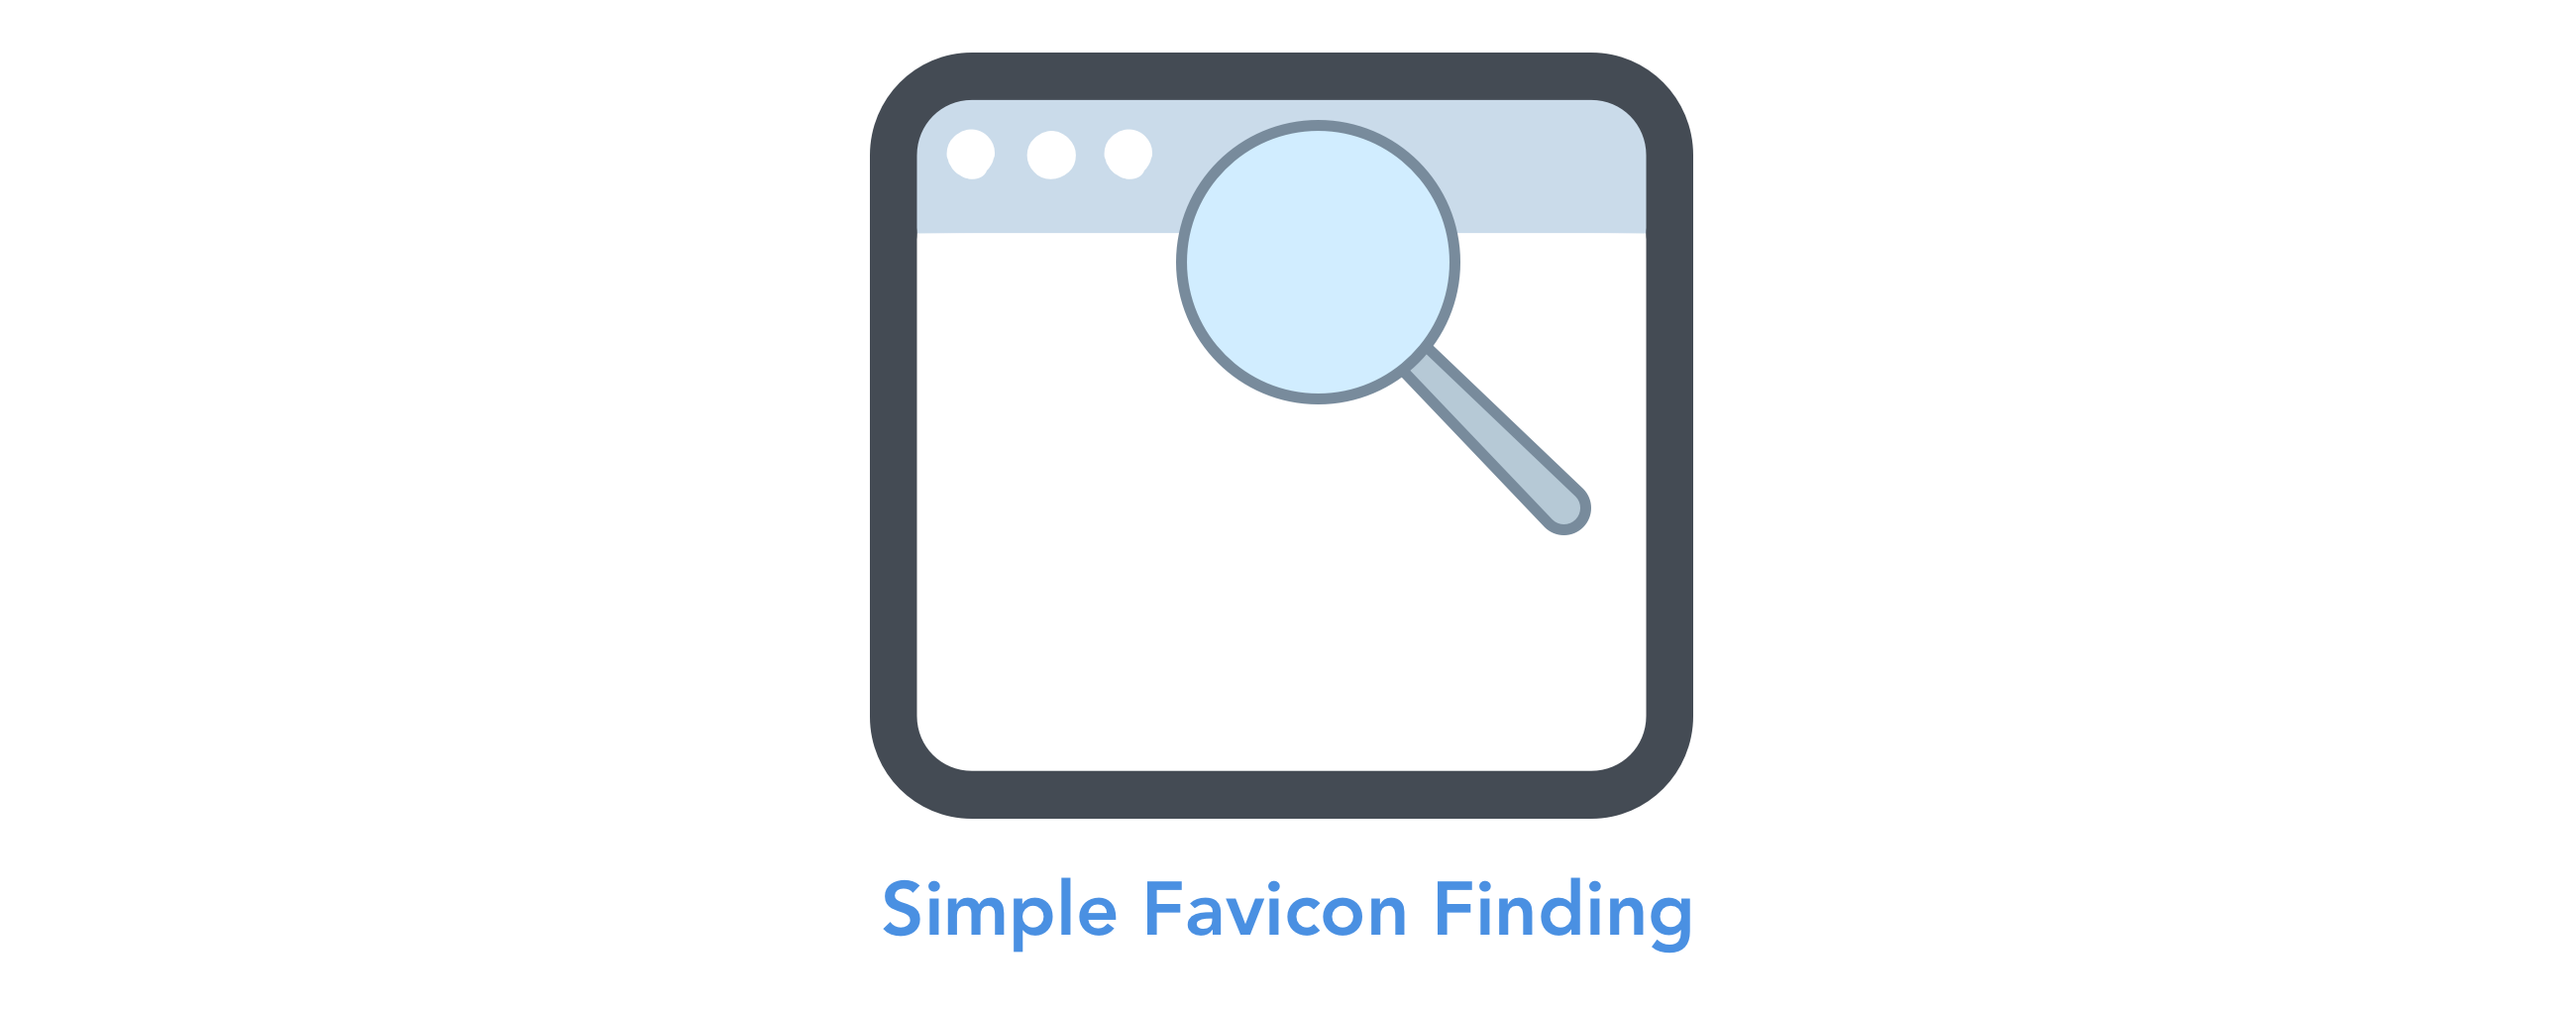 FaviconFinder: Simple Favicon Finding